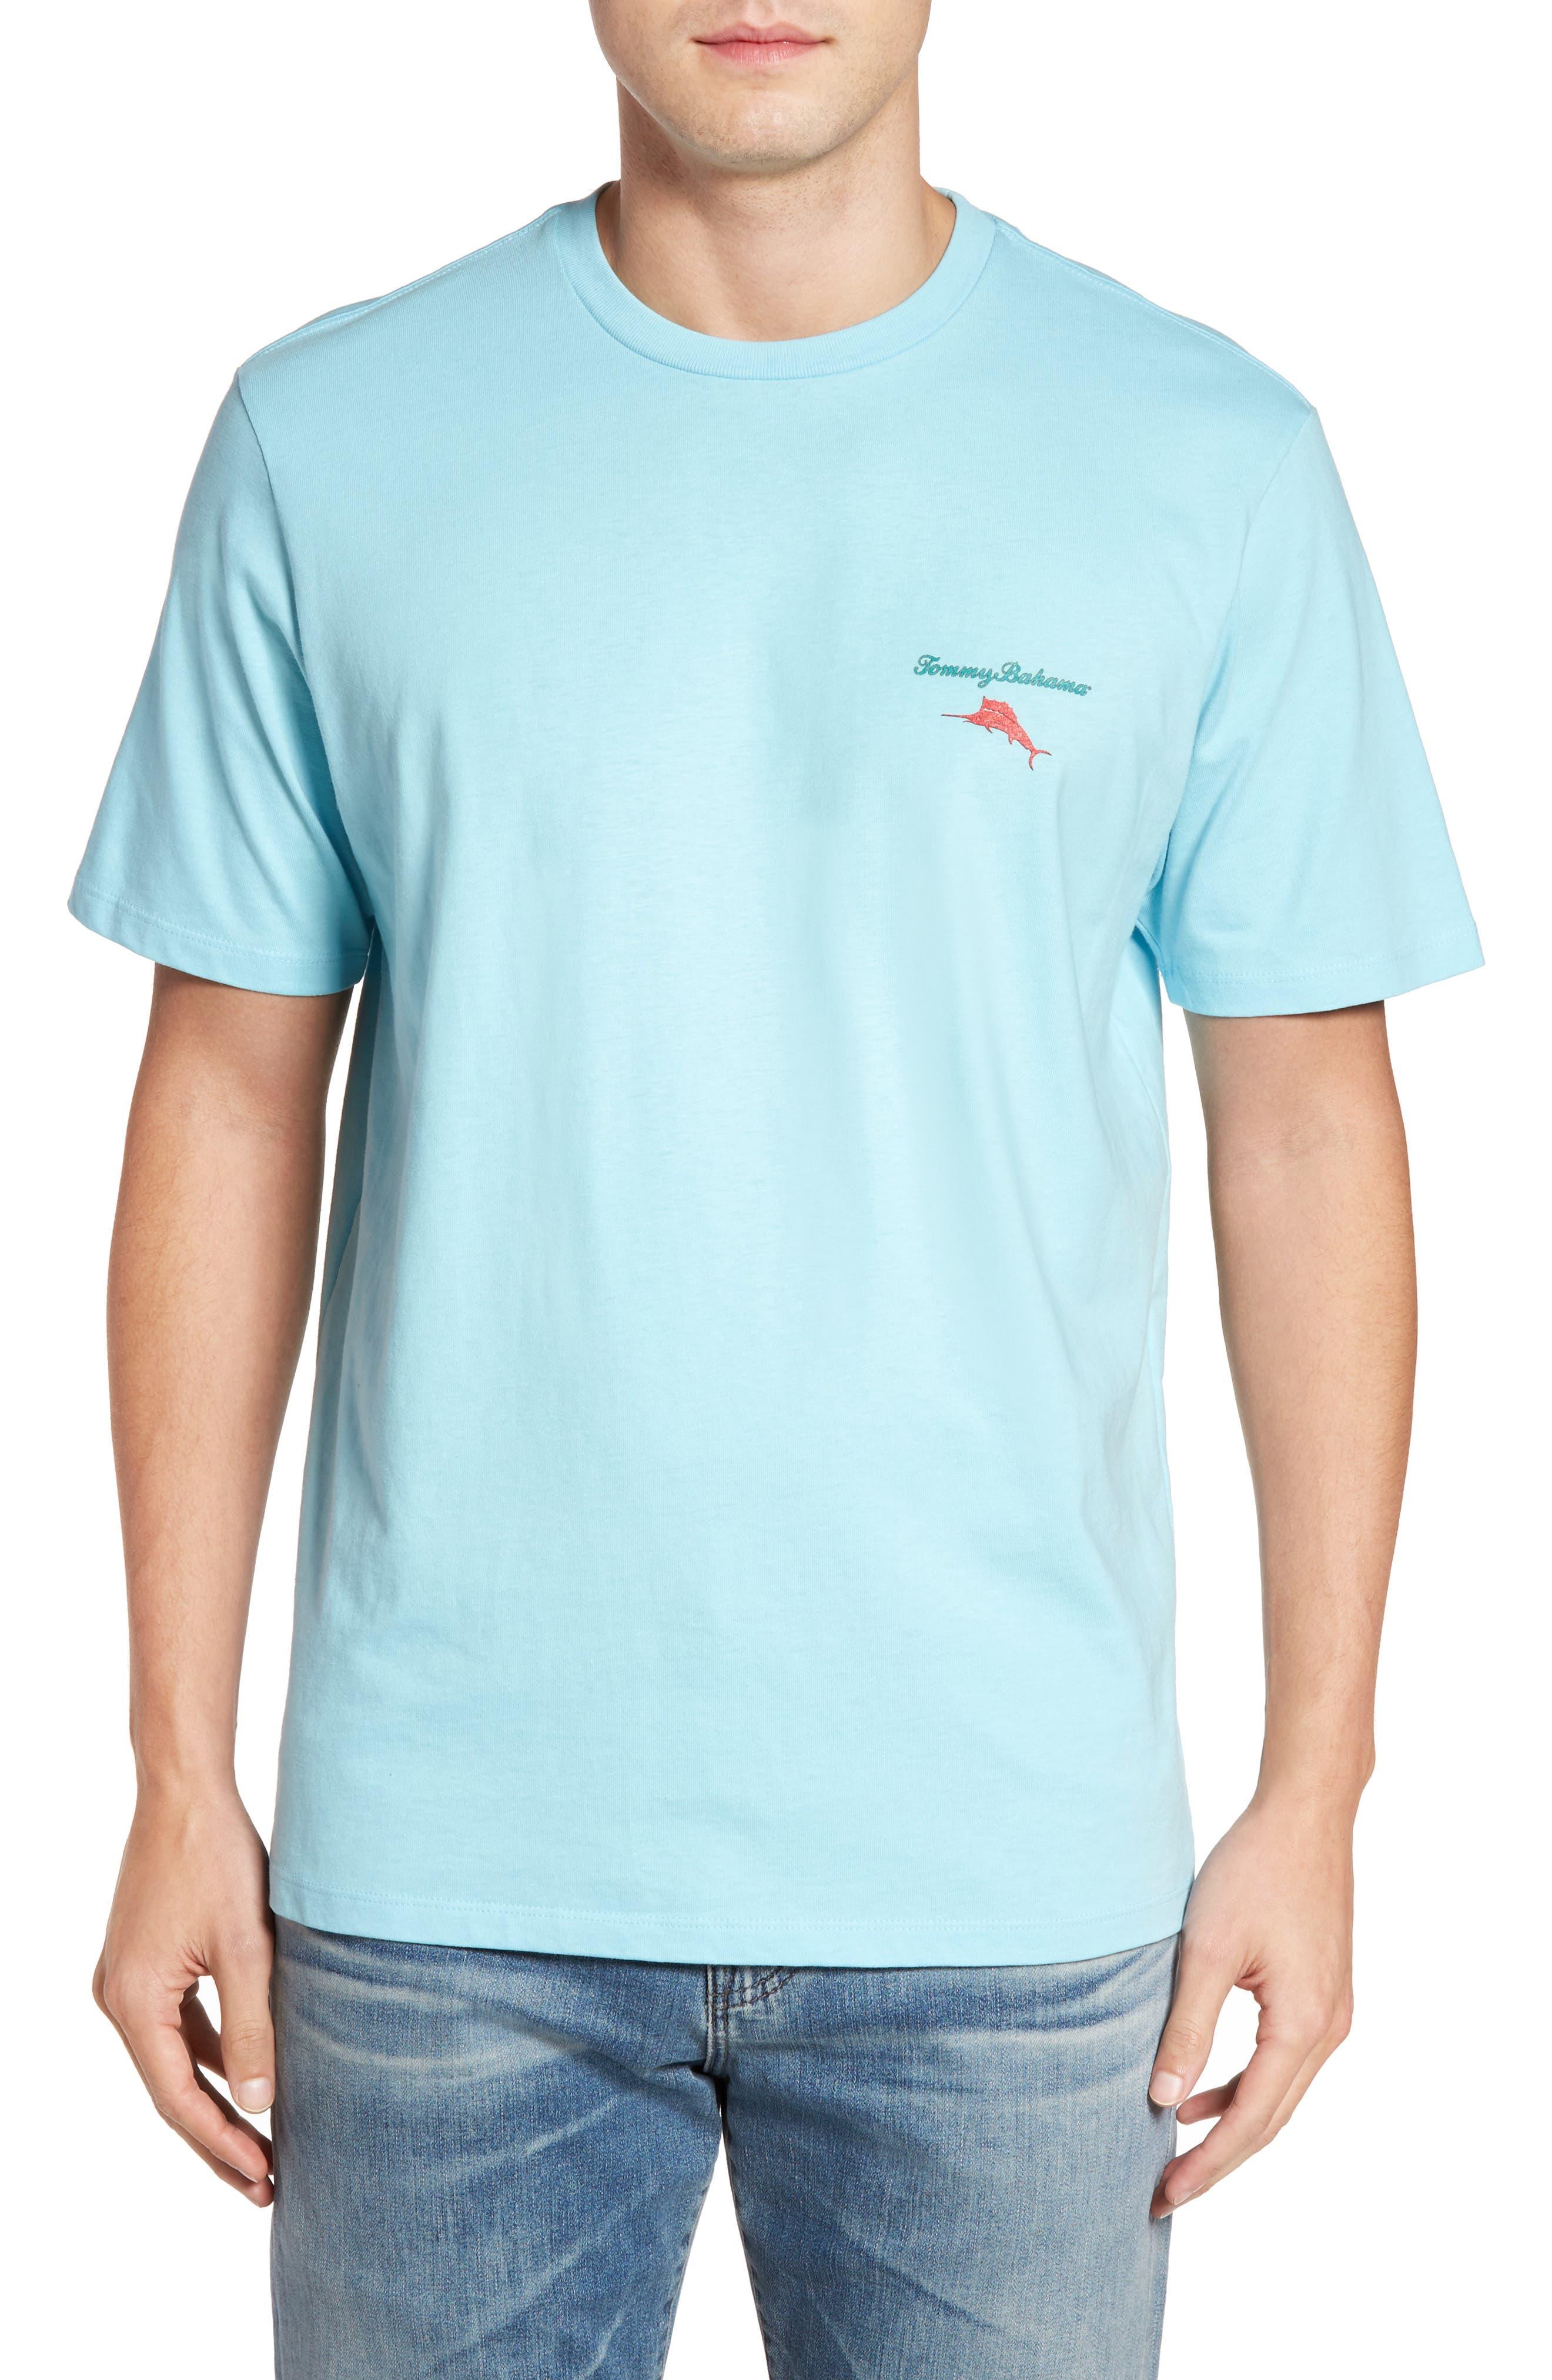 Pineapple TV Graphic T-Shirt,                             Main thumbnail 1, color,